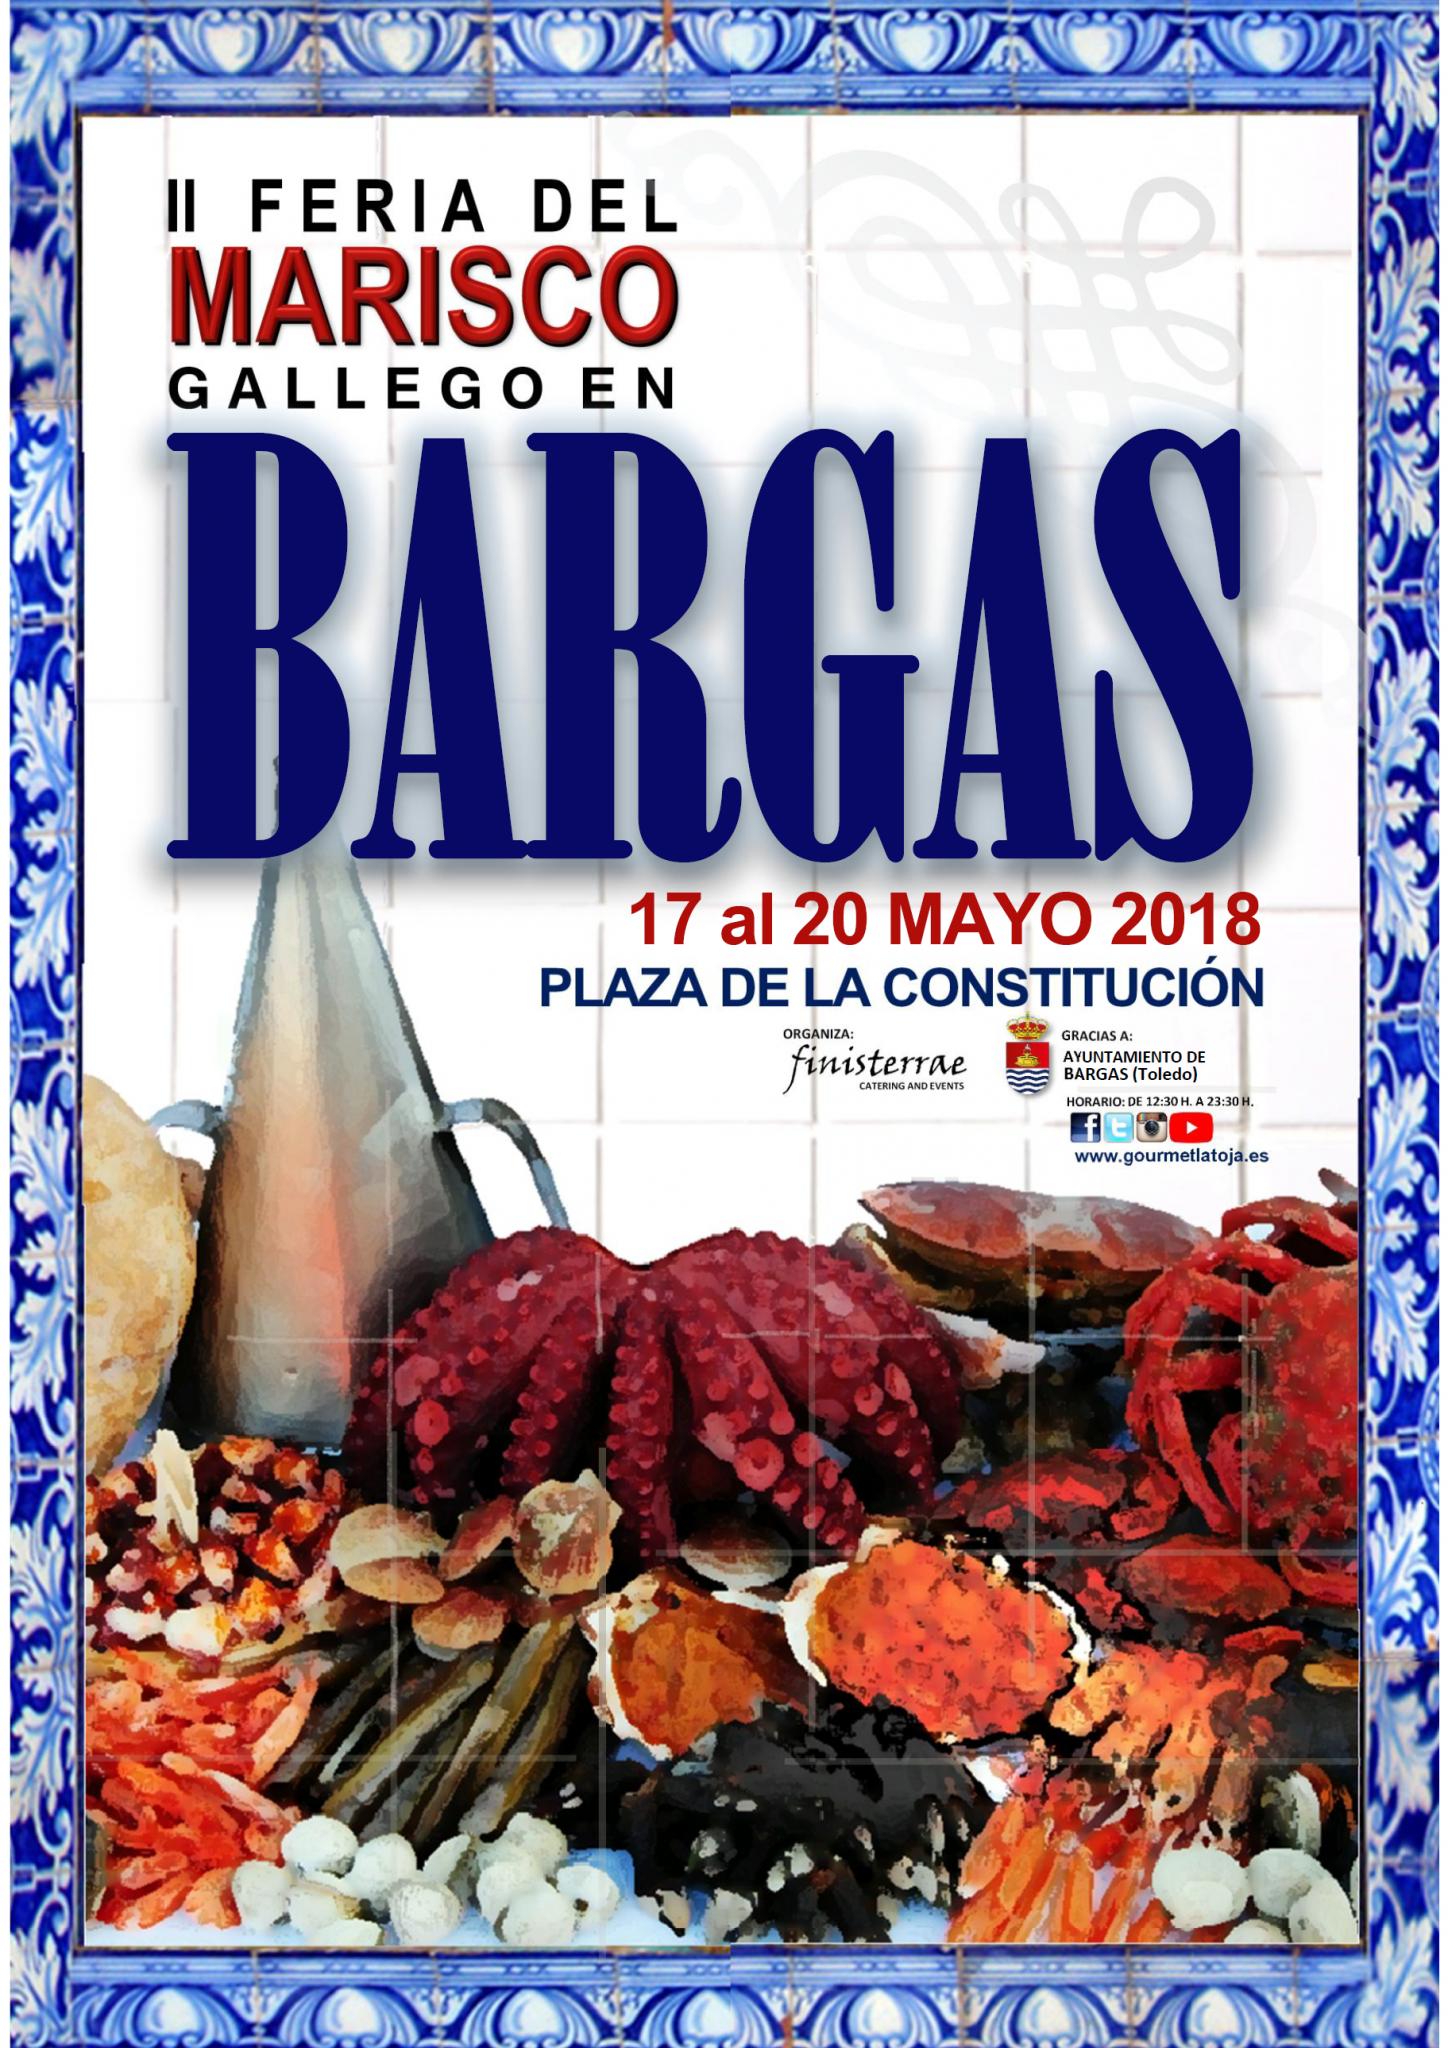 II Feria del Marisco Gallego